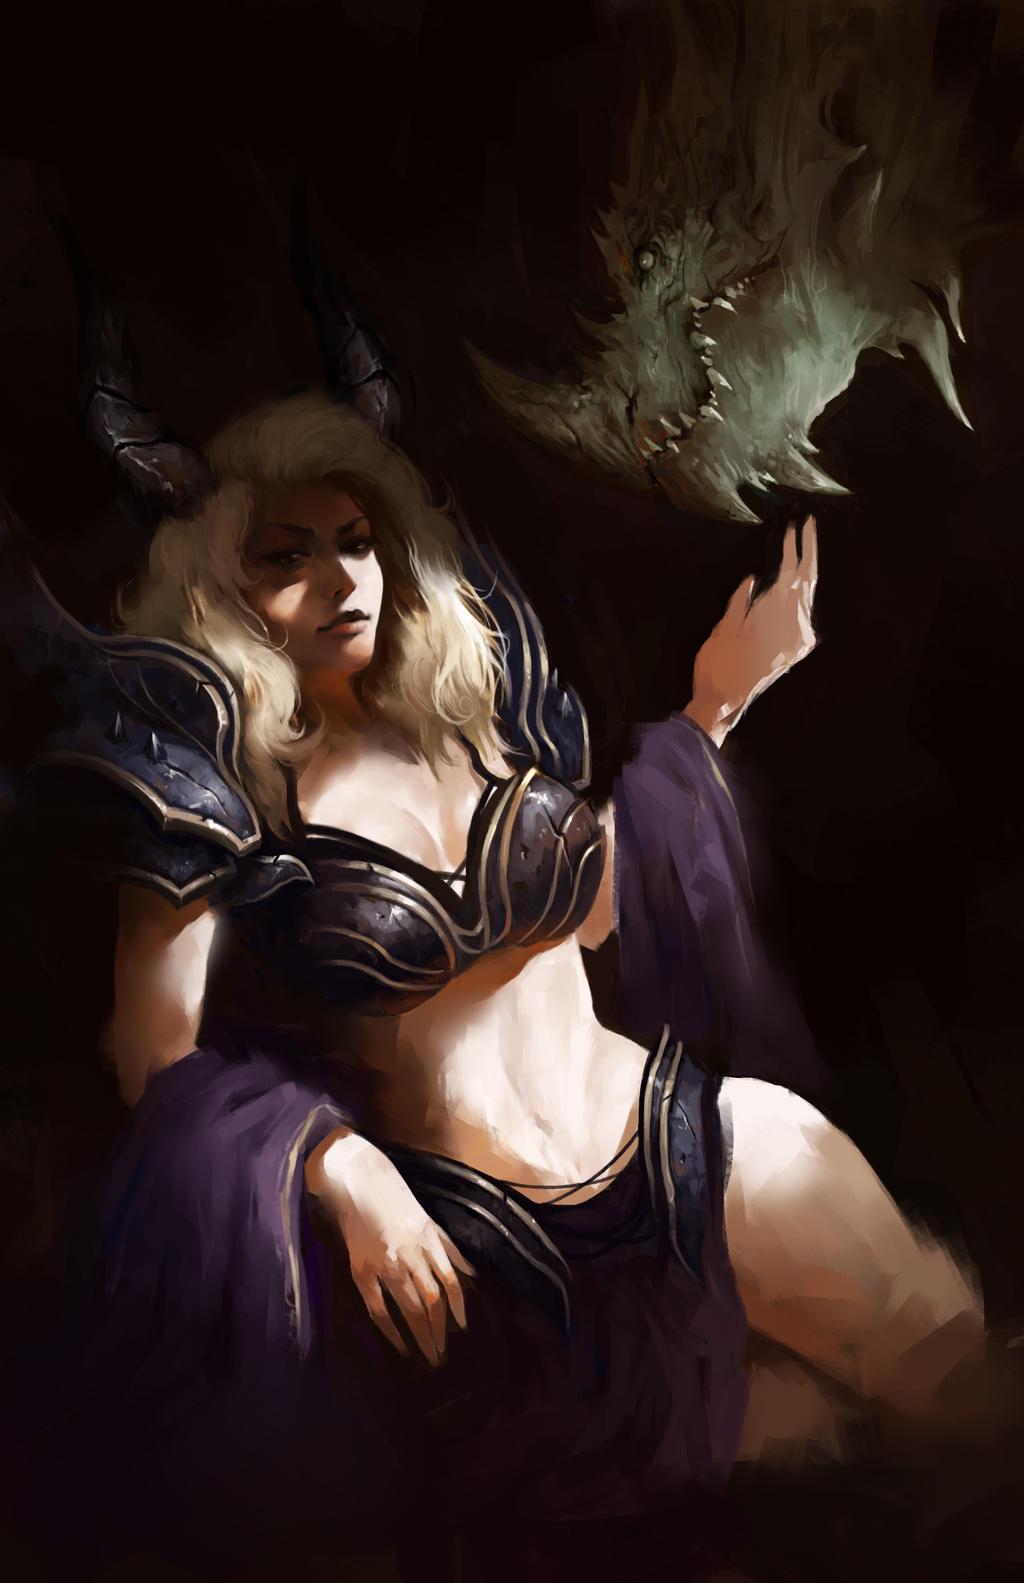 Reign Of Dragon5 by nntan92